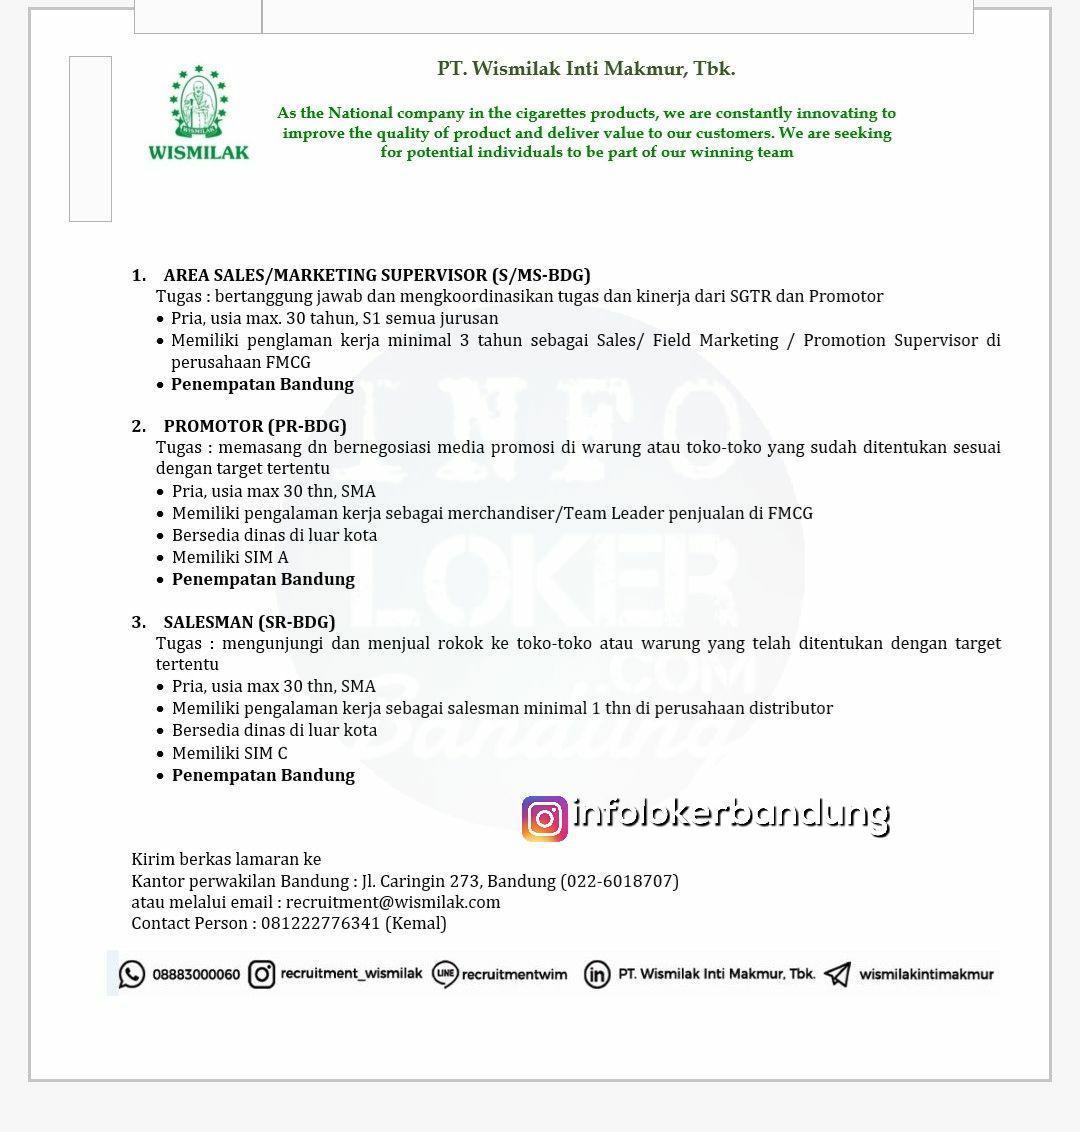 Lowongan Kerja PT. Wismilak Inti Makmur Tbk Bandung Maret 2018